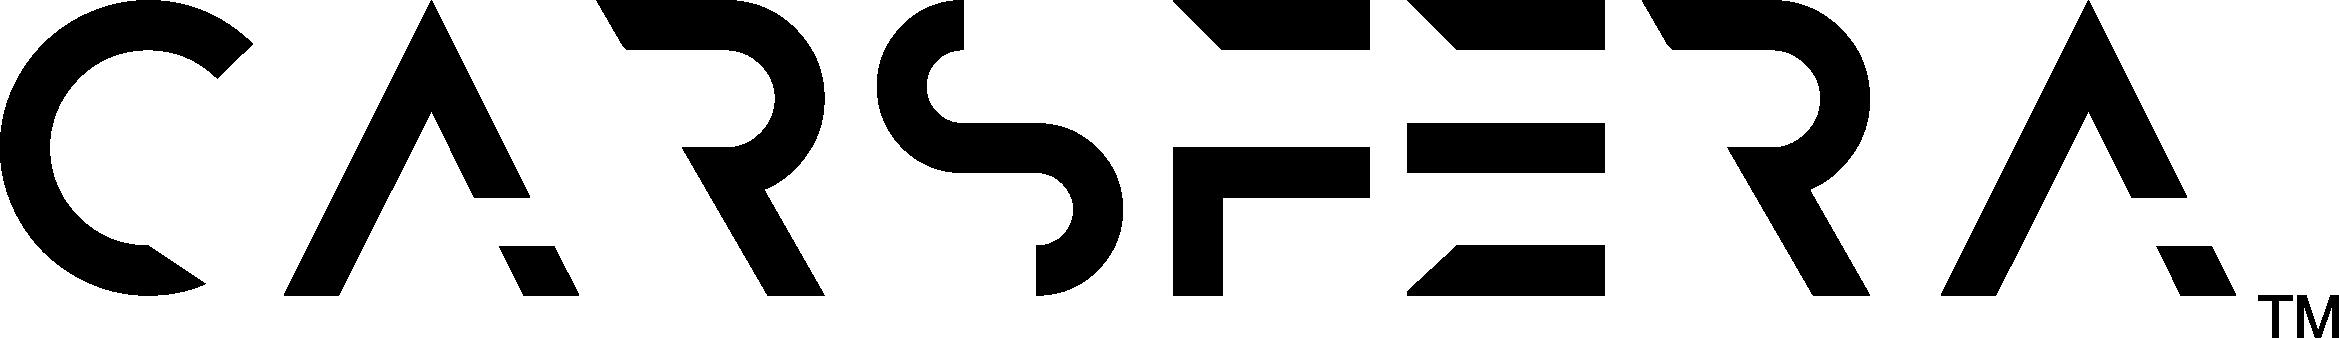 Carsfera